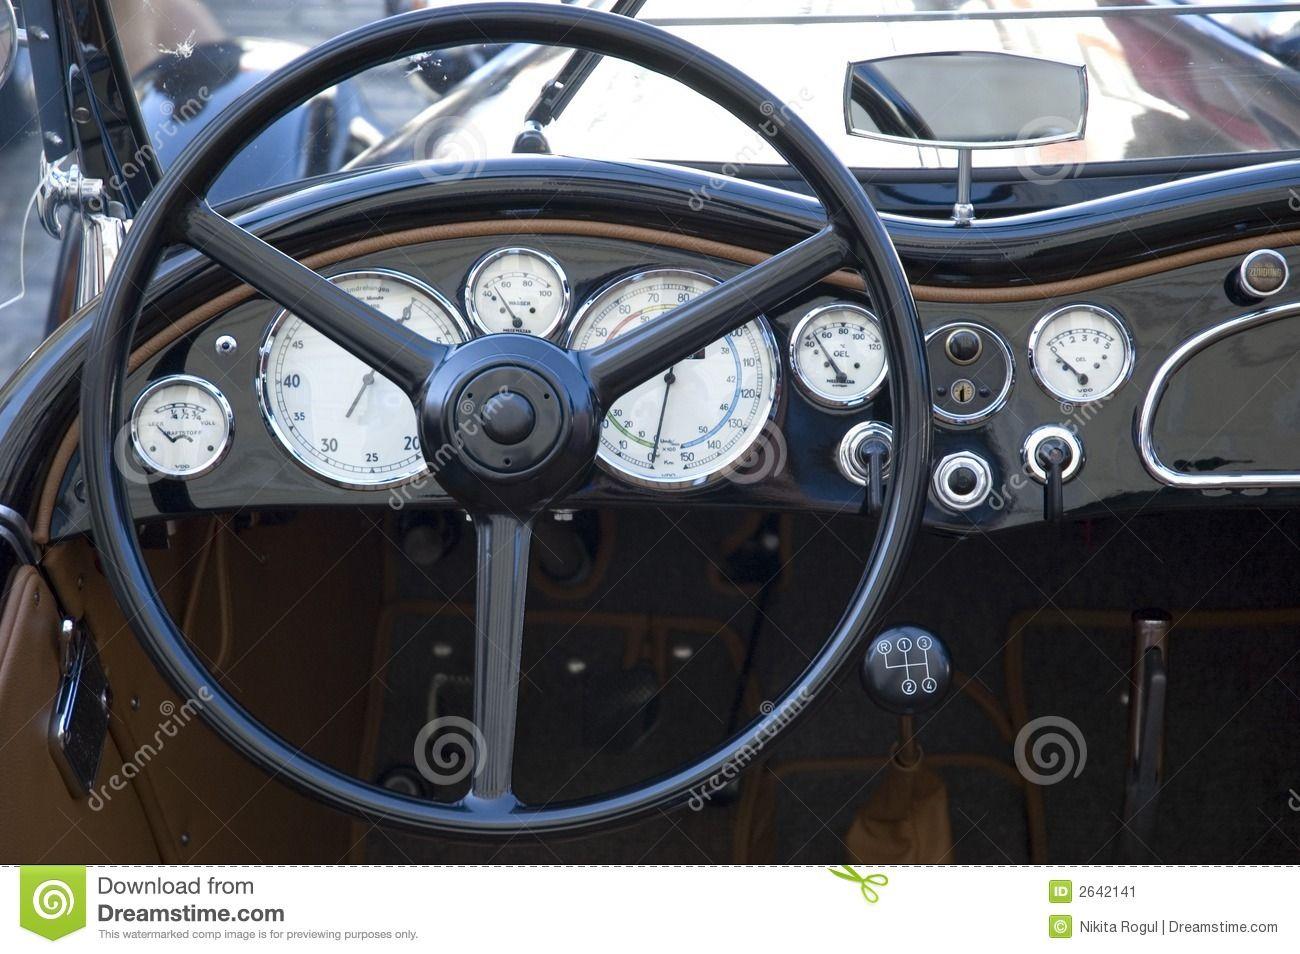 auto dashboards - Google Search | Dashboards | Pinterest